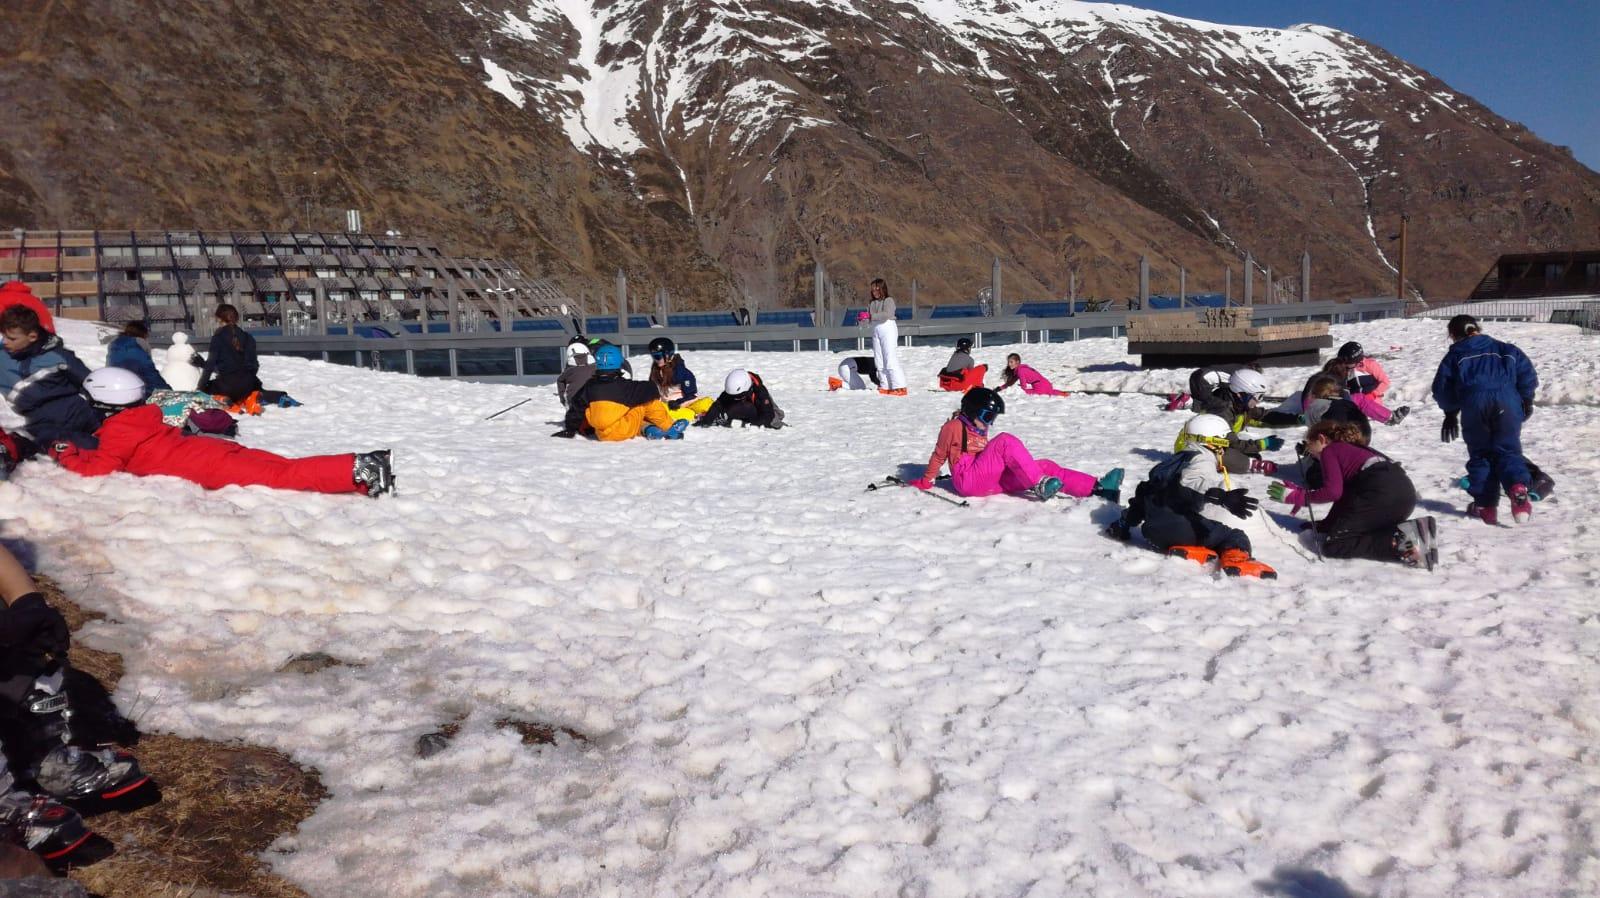 Séjour au ski jour 4